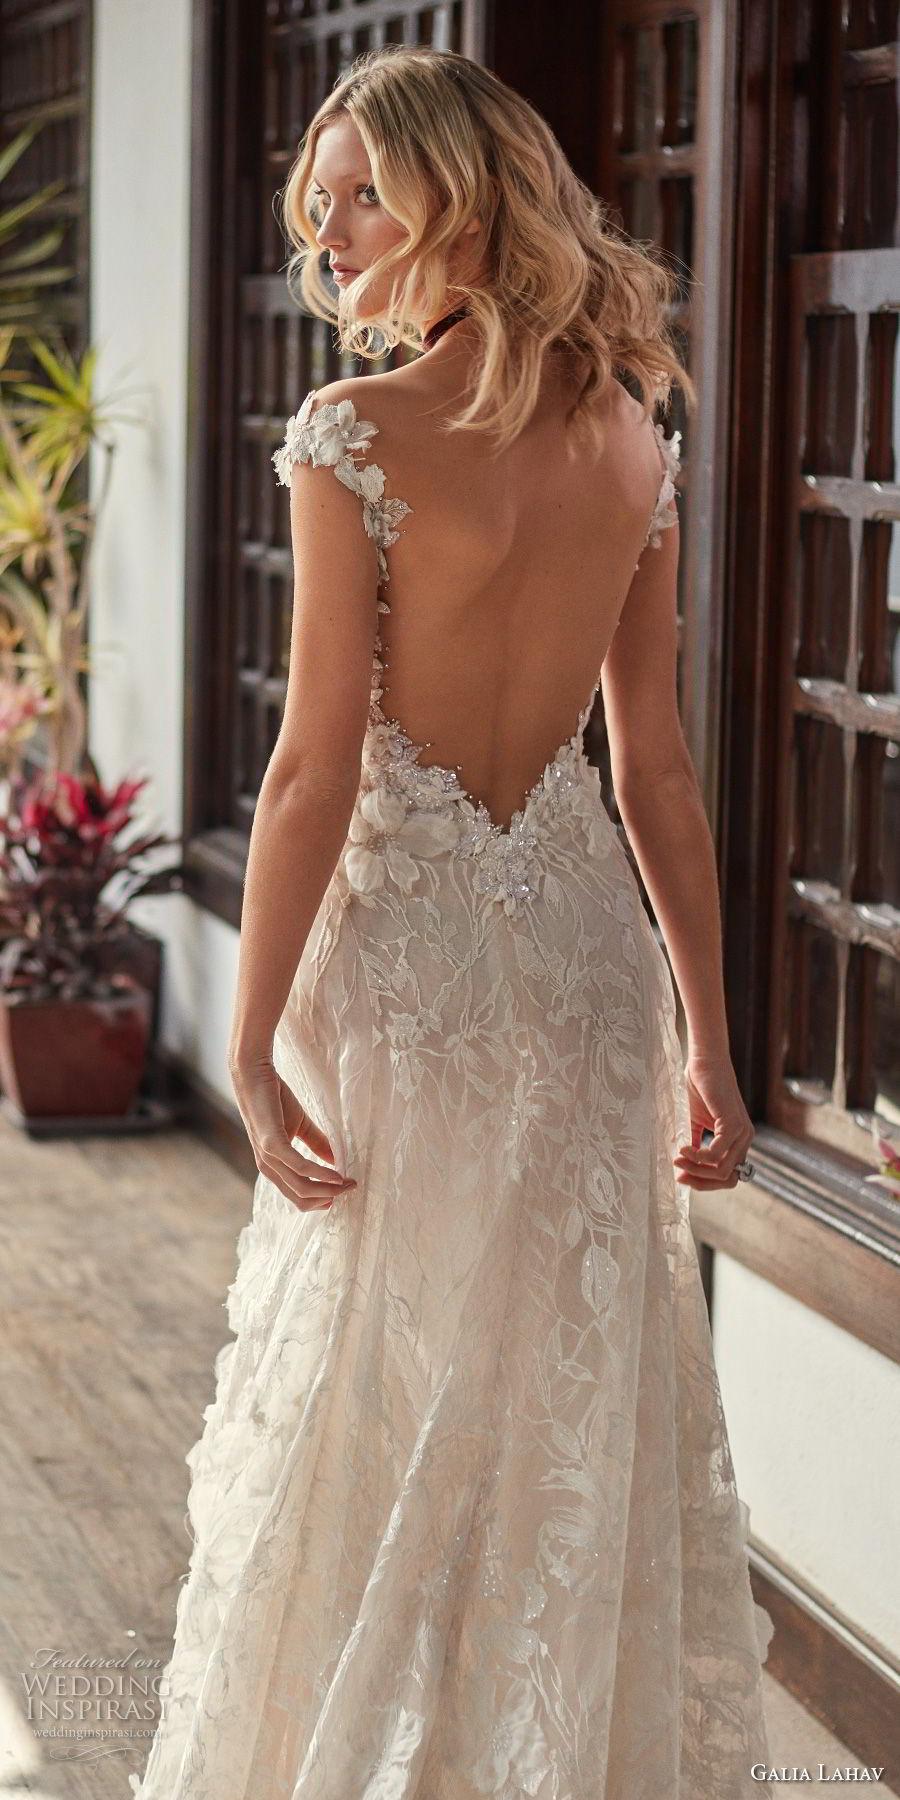 galia lahav couture fall 2018 bridal cap sleeves sweetheart neckline full embellishment elegant romantic soft a  line wedding dress low open back sweep train (17) zbv